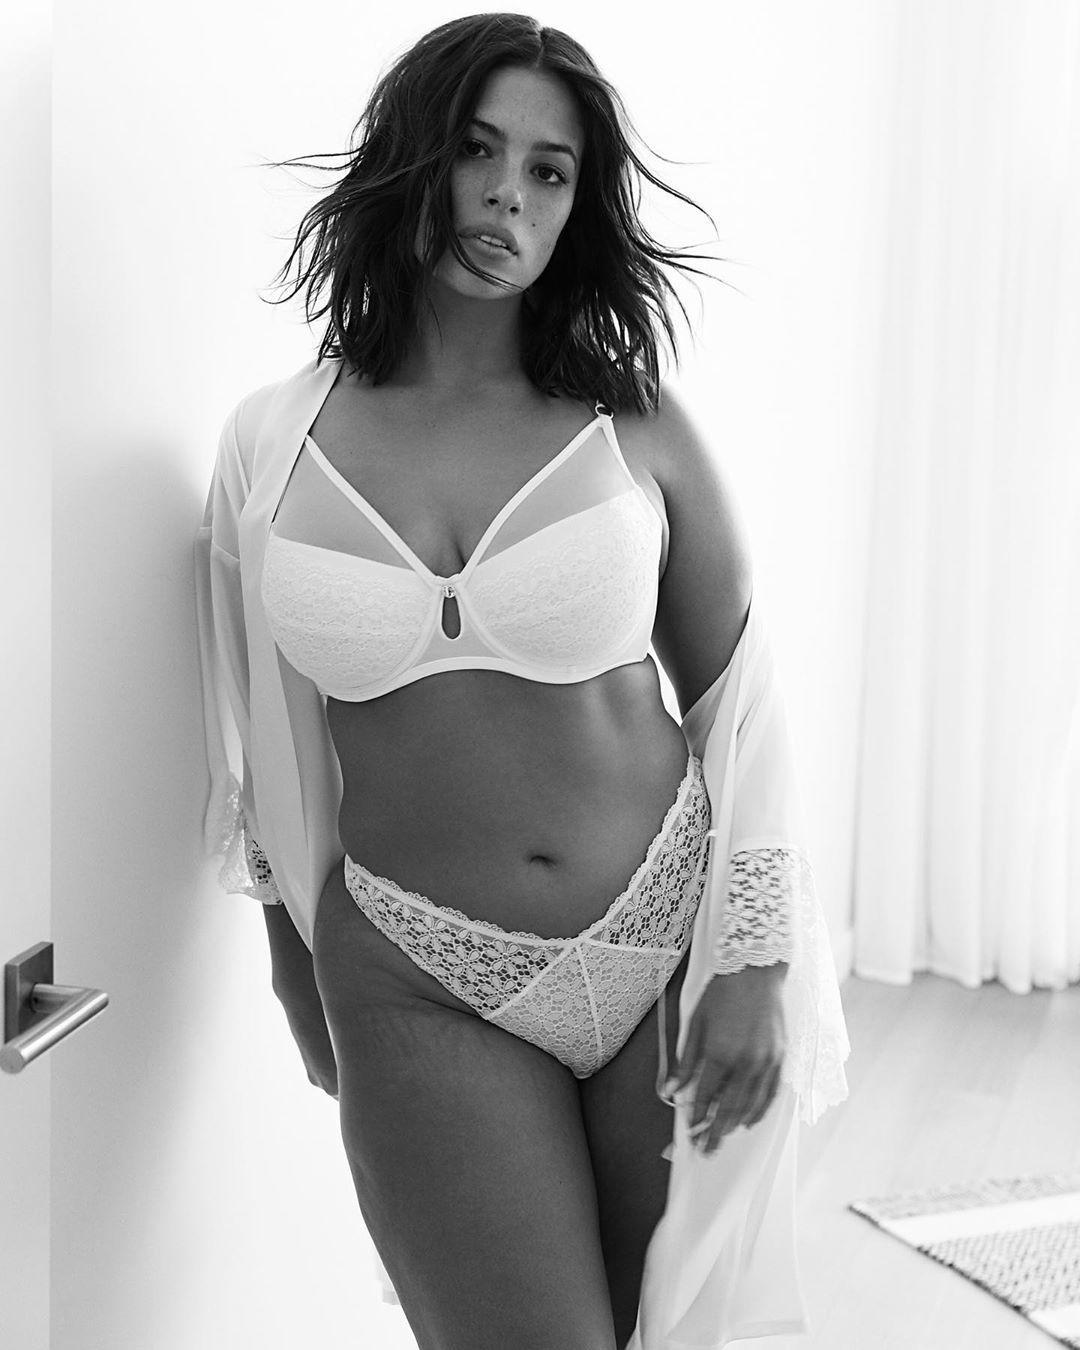 Modelo plus size Ashley Graham exibe estrias ao posar de lingerie branca